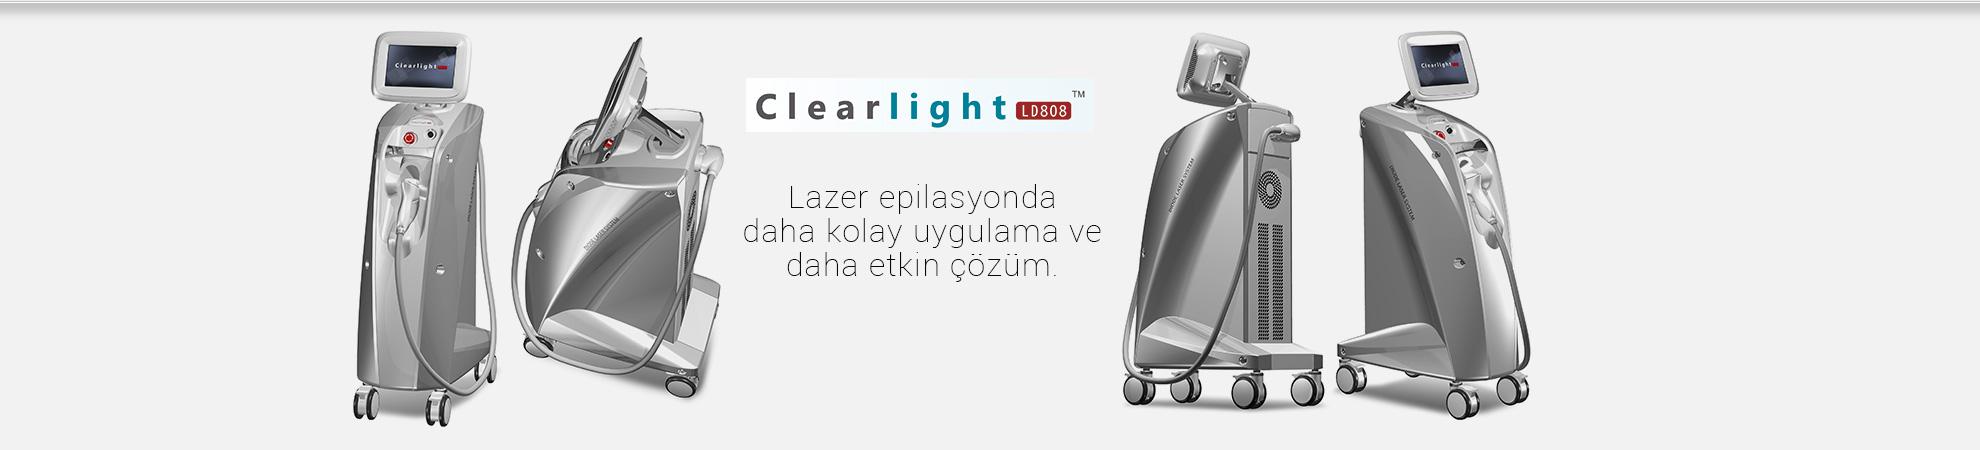 clear-light-banner